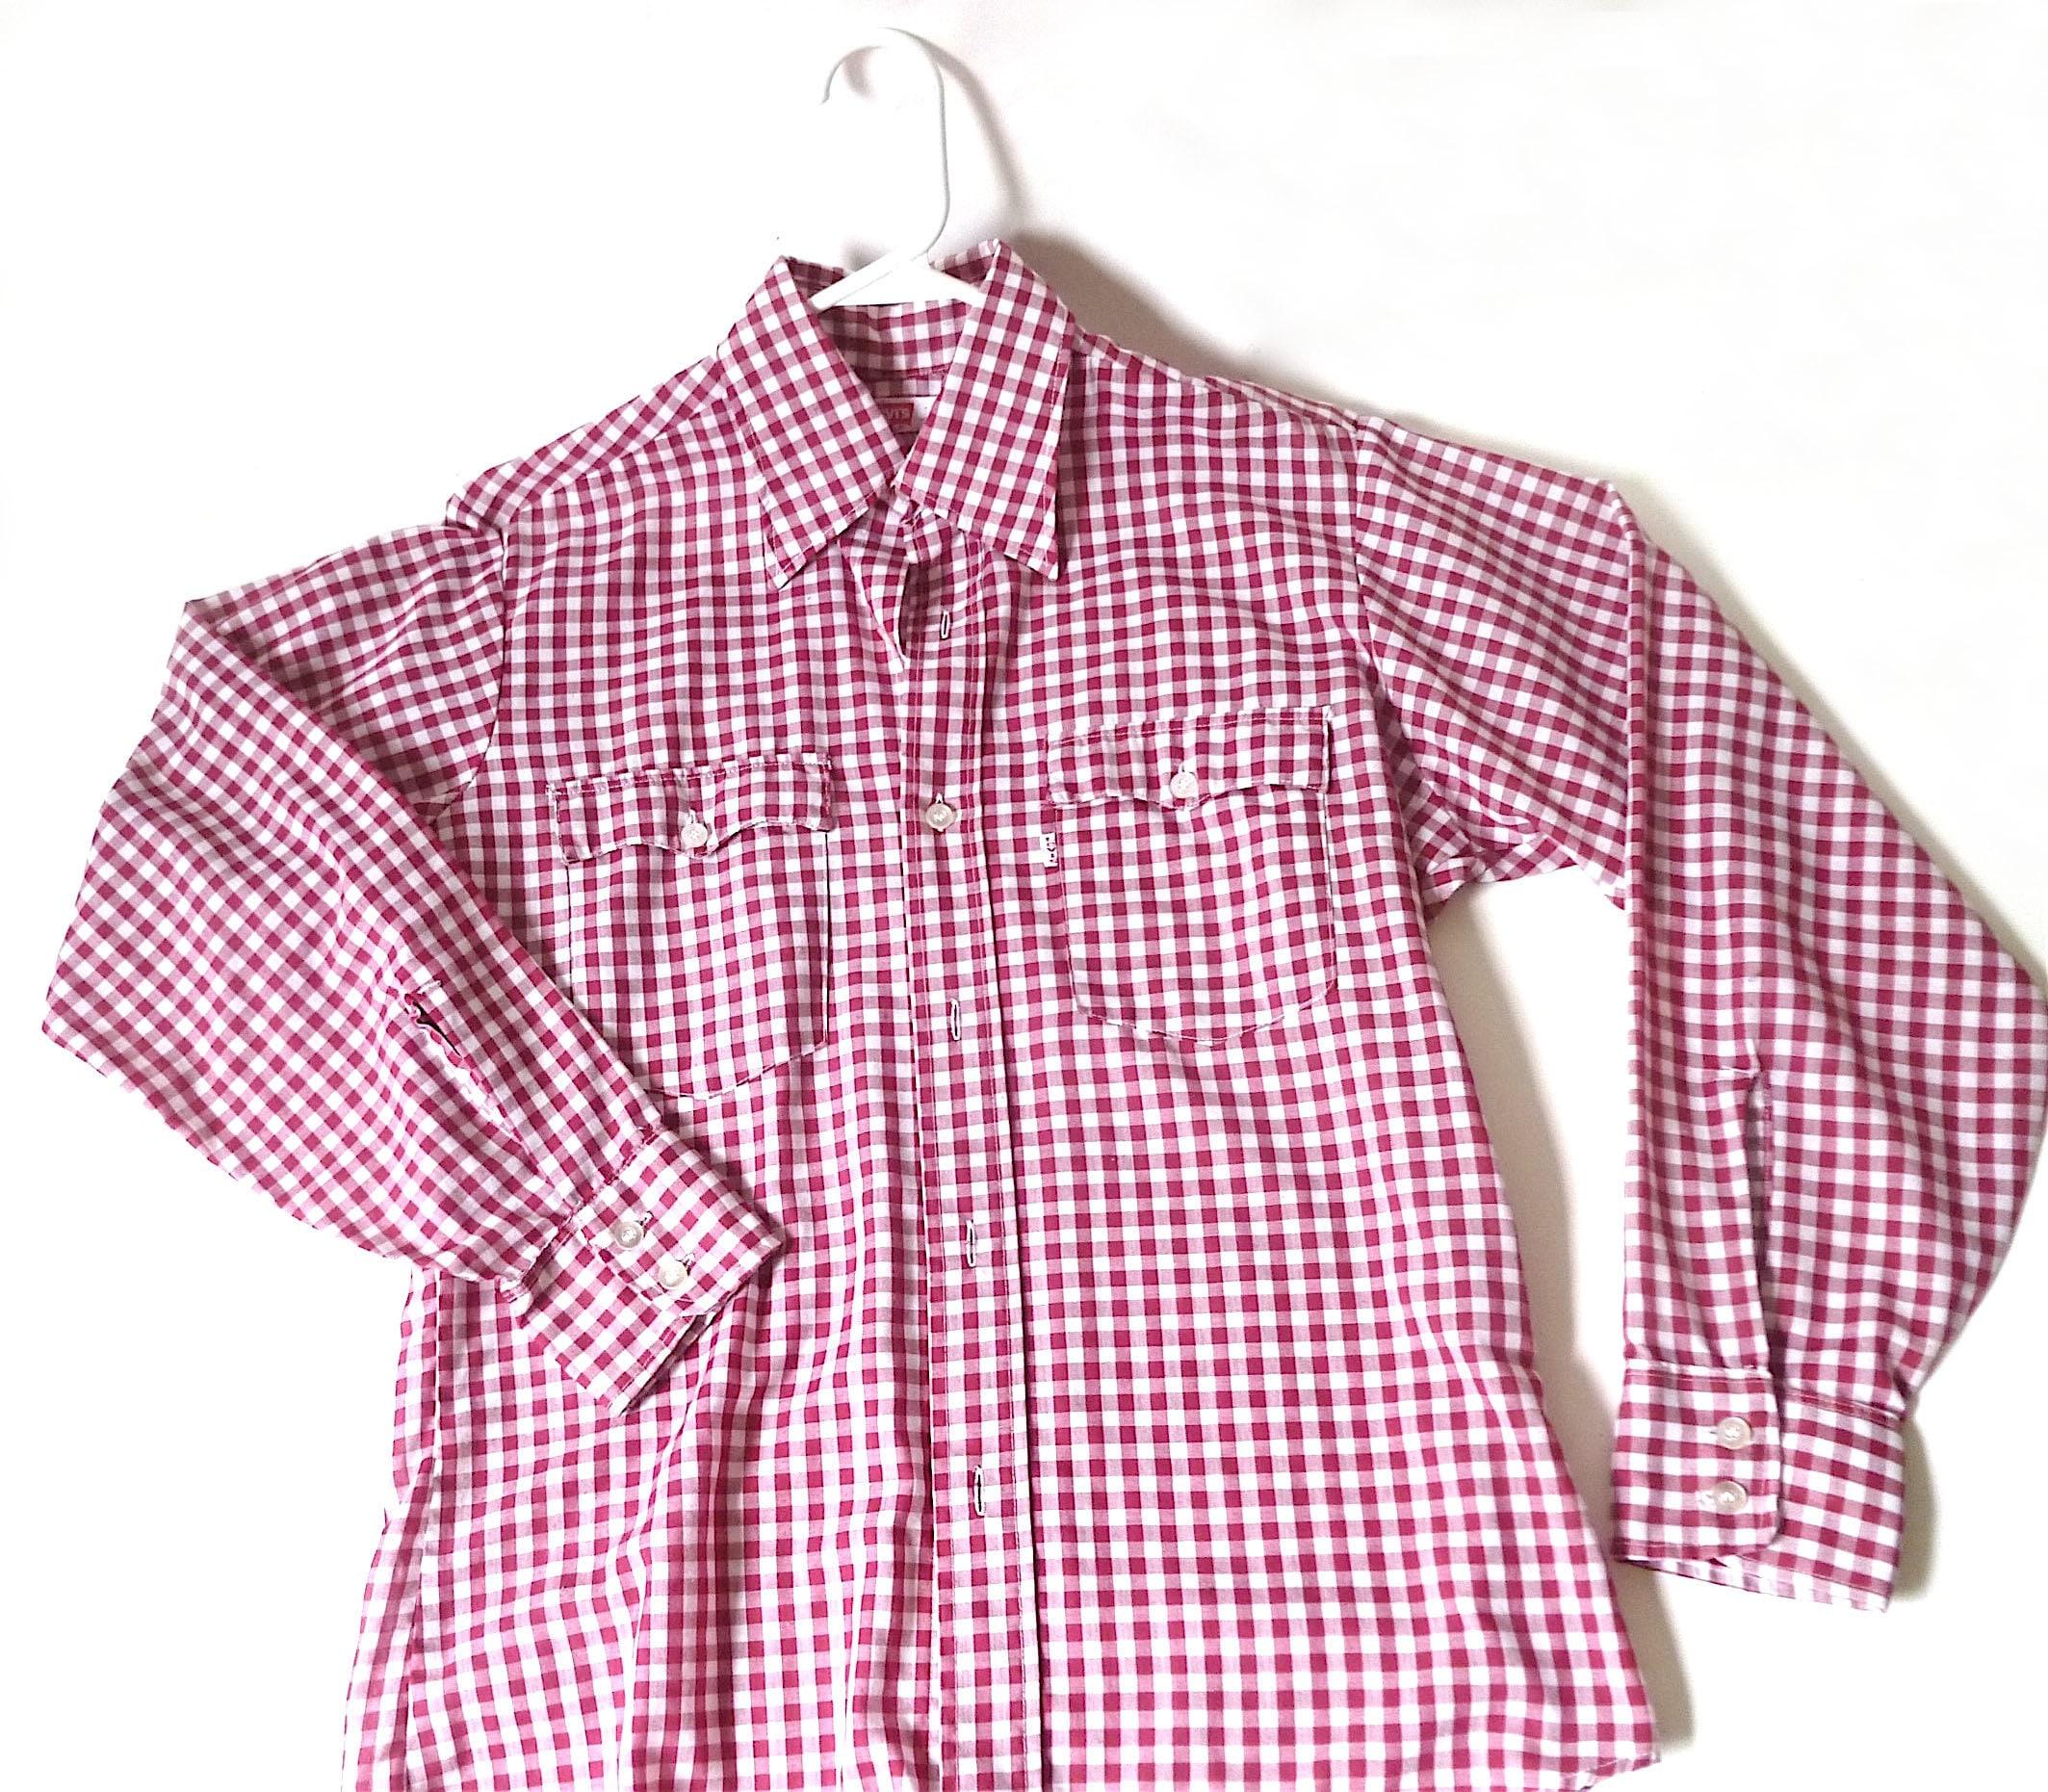 1970s Men's Shirt Styles – Vintage 70s Shirts for Guys Vintage Levis Gingham Shirt ... Mens 1970S Plaid Cotton Button Down, Burgundy Checkered Medium Blouse Top Boyfriend Cowboy Retro $19.00 AT vintagedancer.com